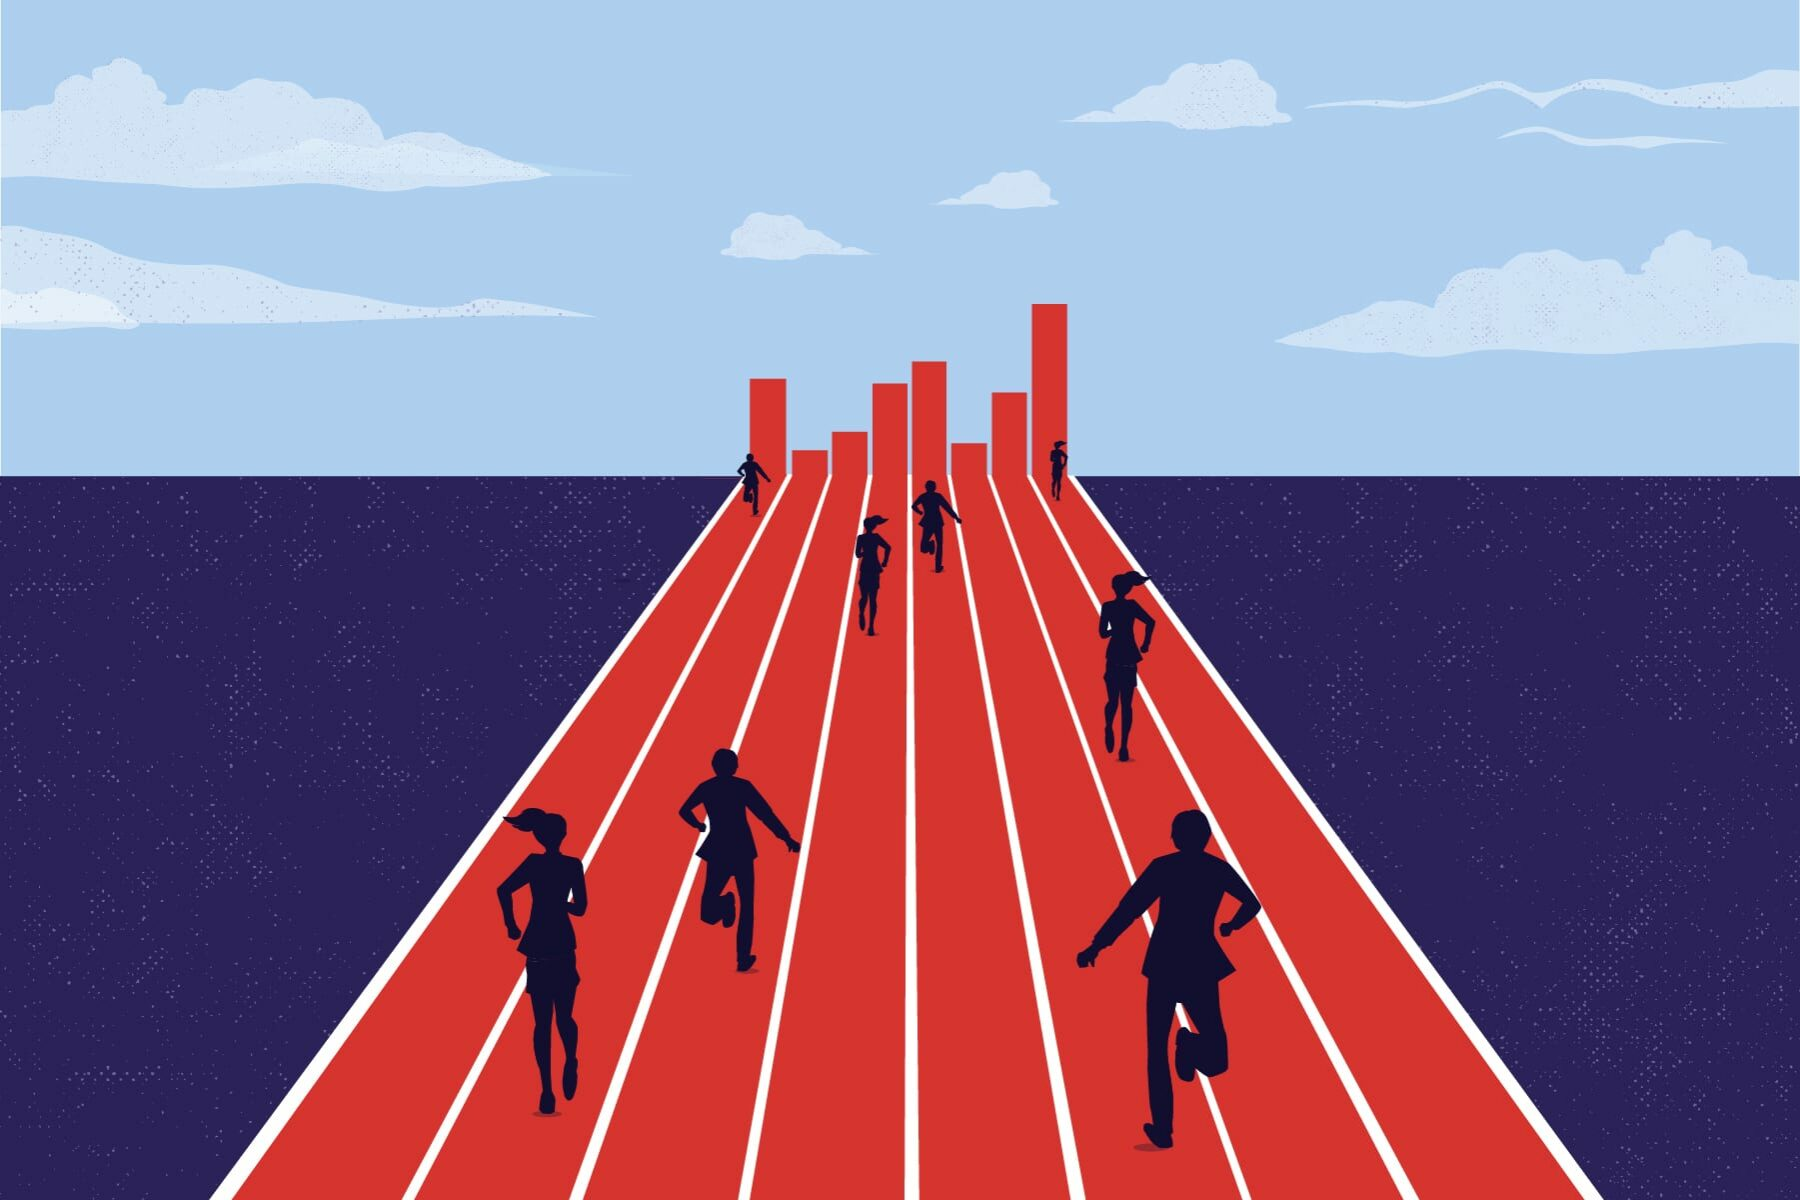 Illustration of Corporate companies BLM financial pledges.